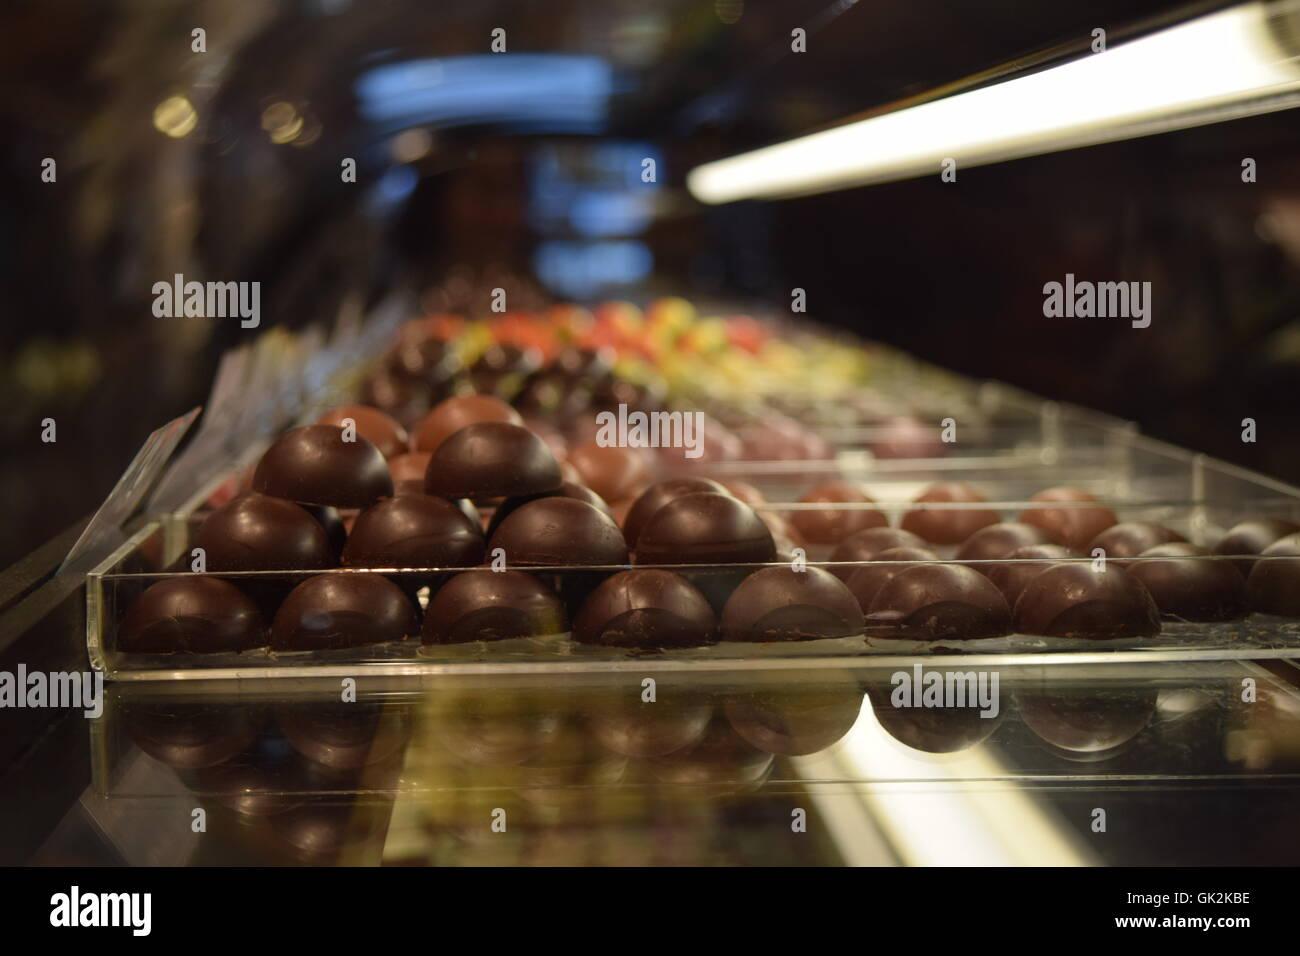 Chocolate Display - Stock Image